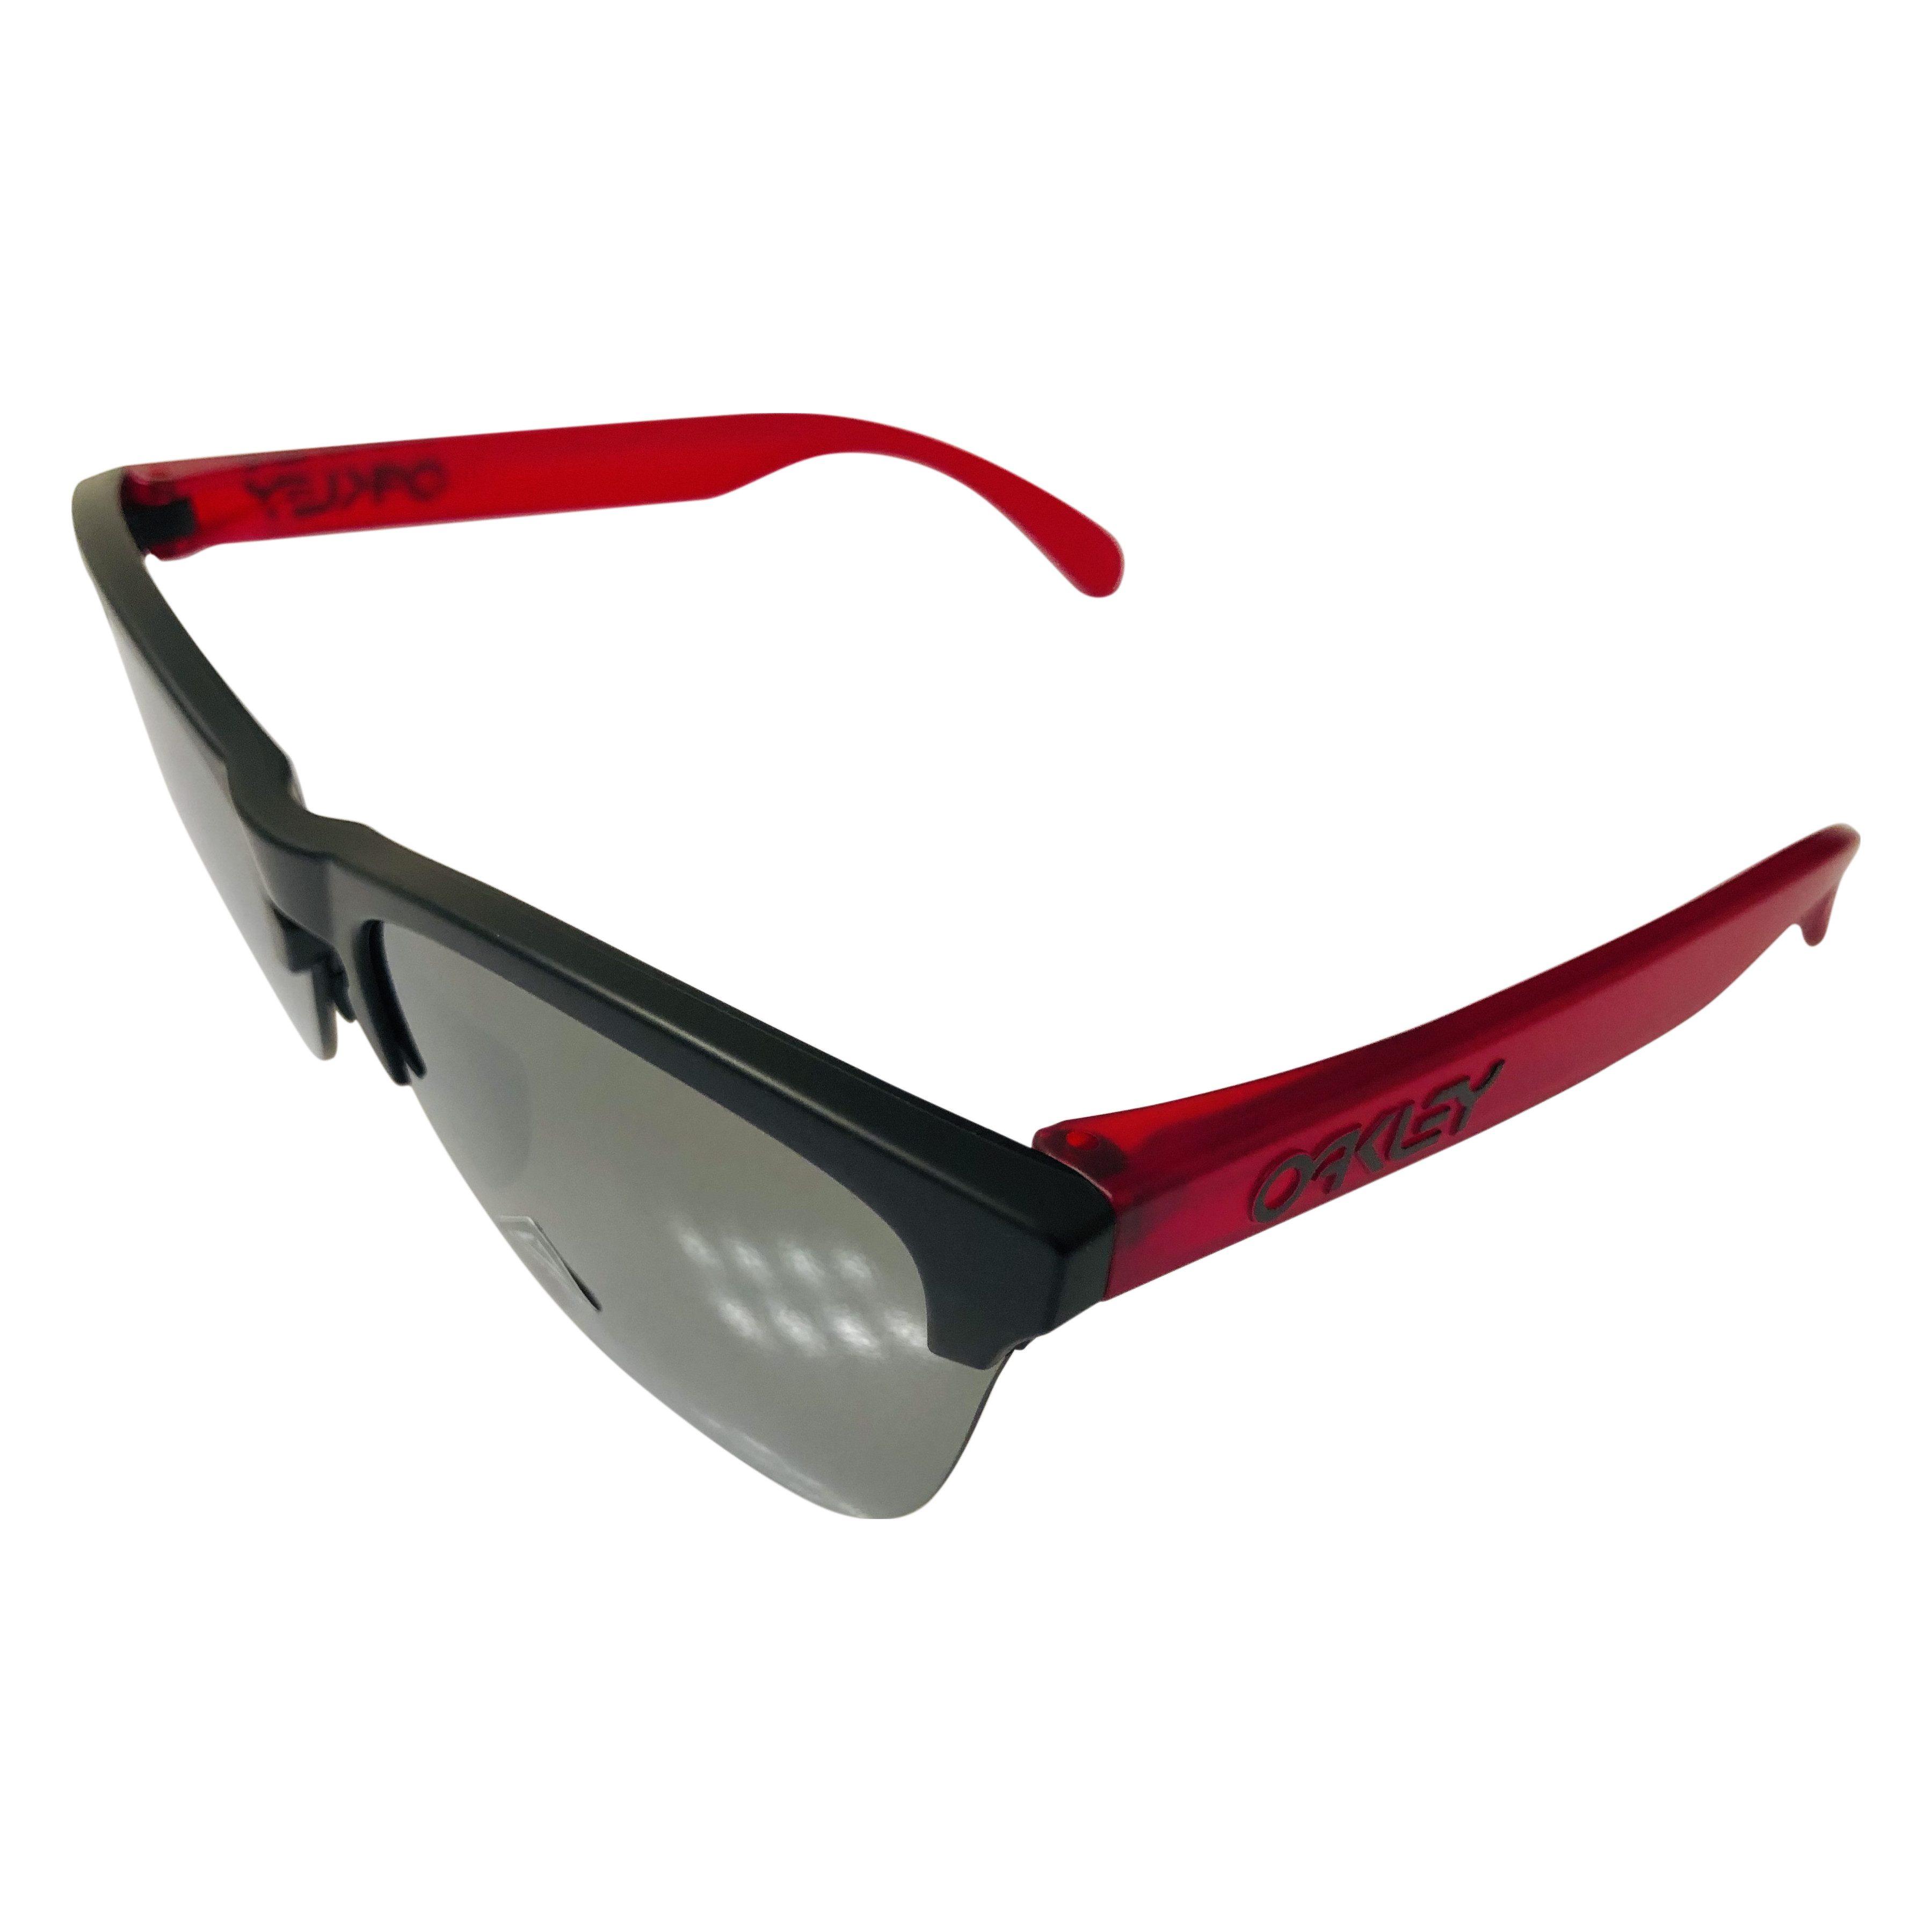 Oakley Frogskins Lite Sunglasses - Matte Black Red OO9374-2063 Prizm Iridium